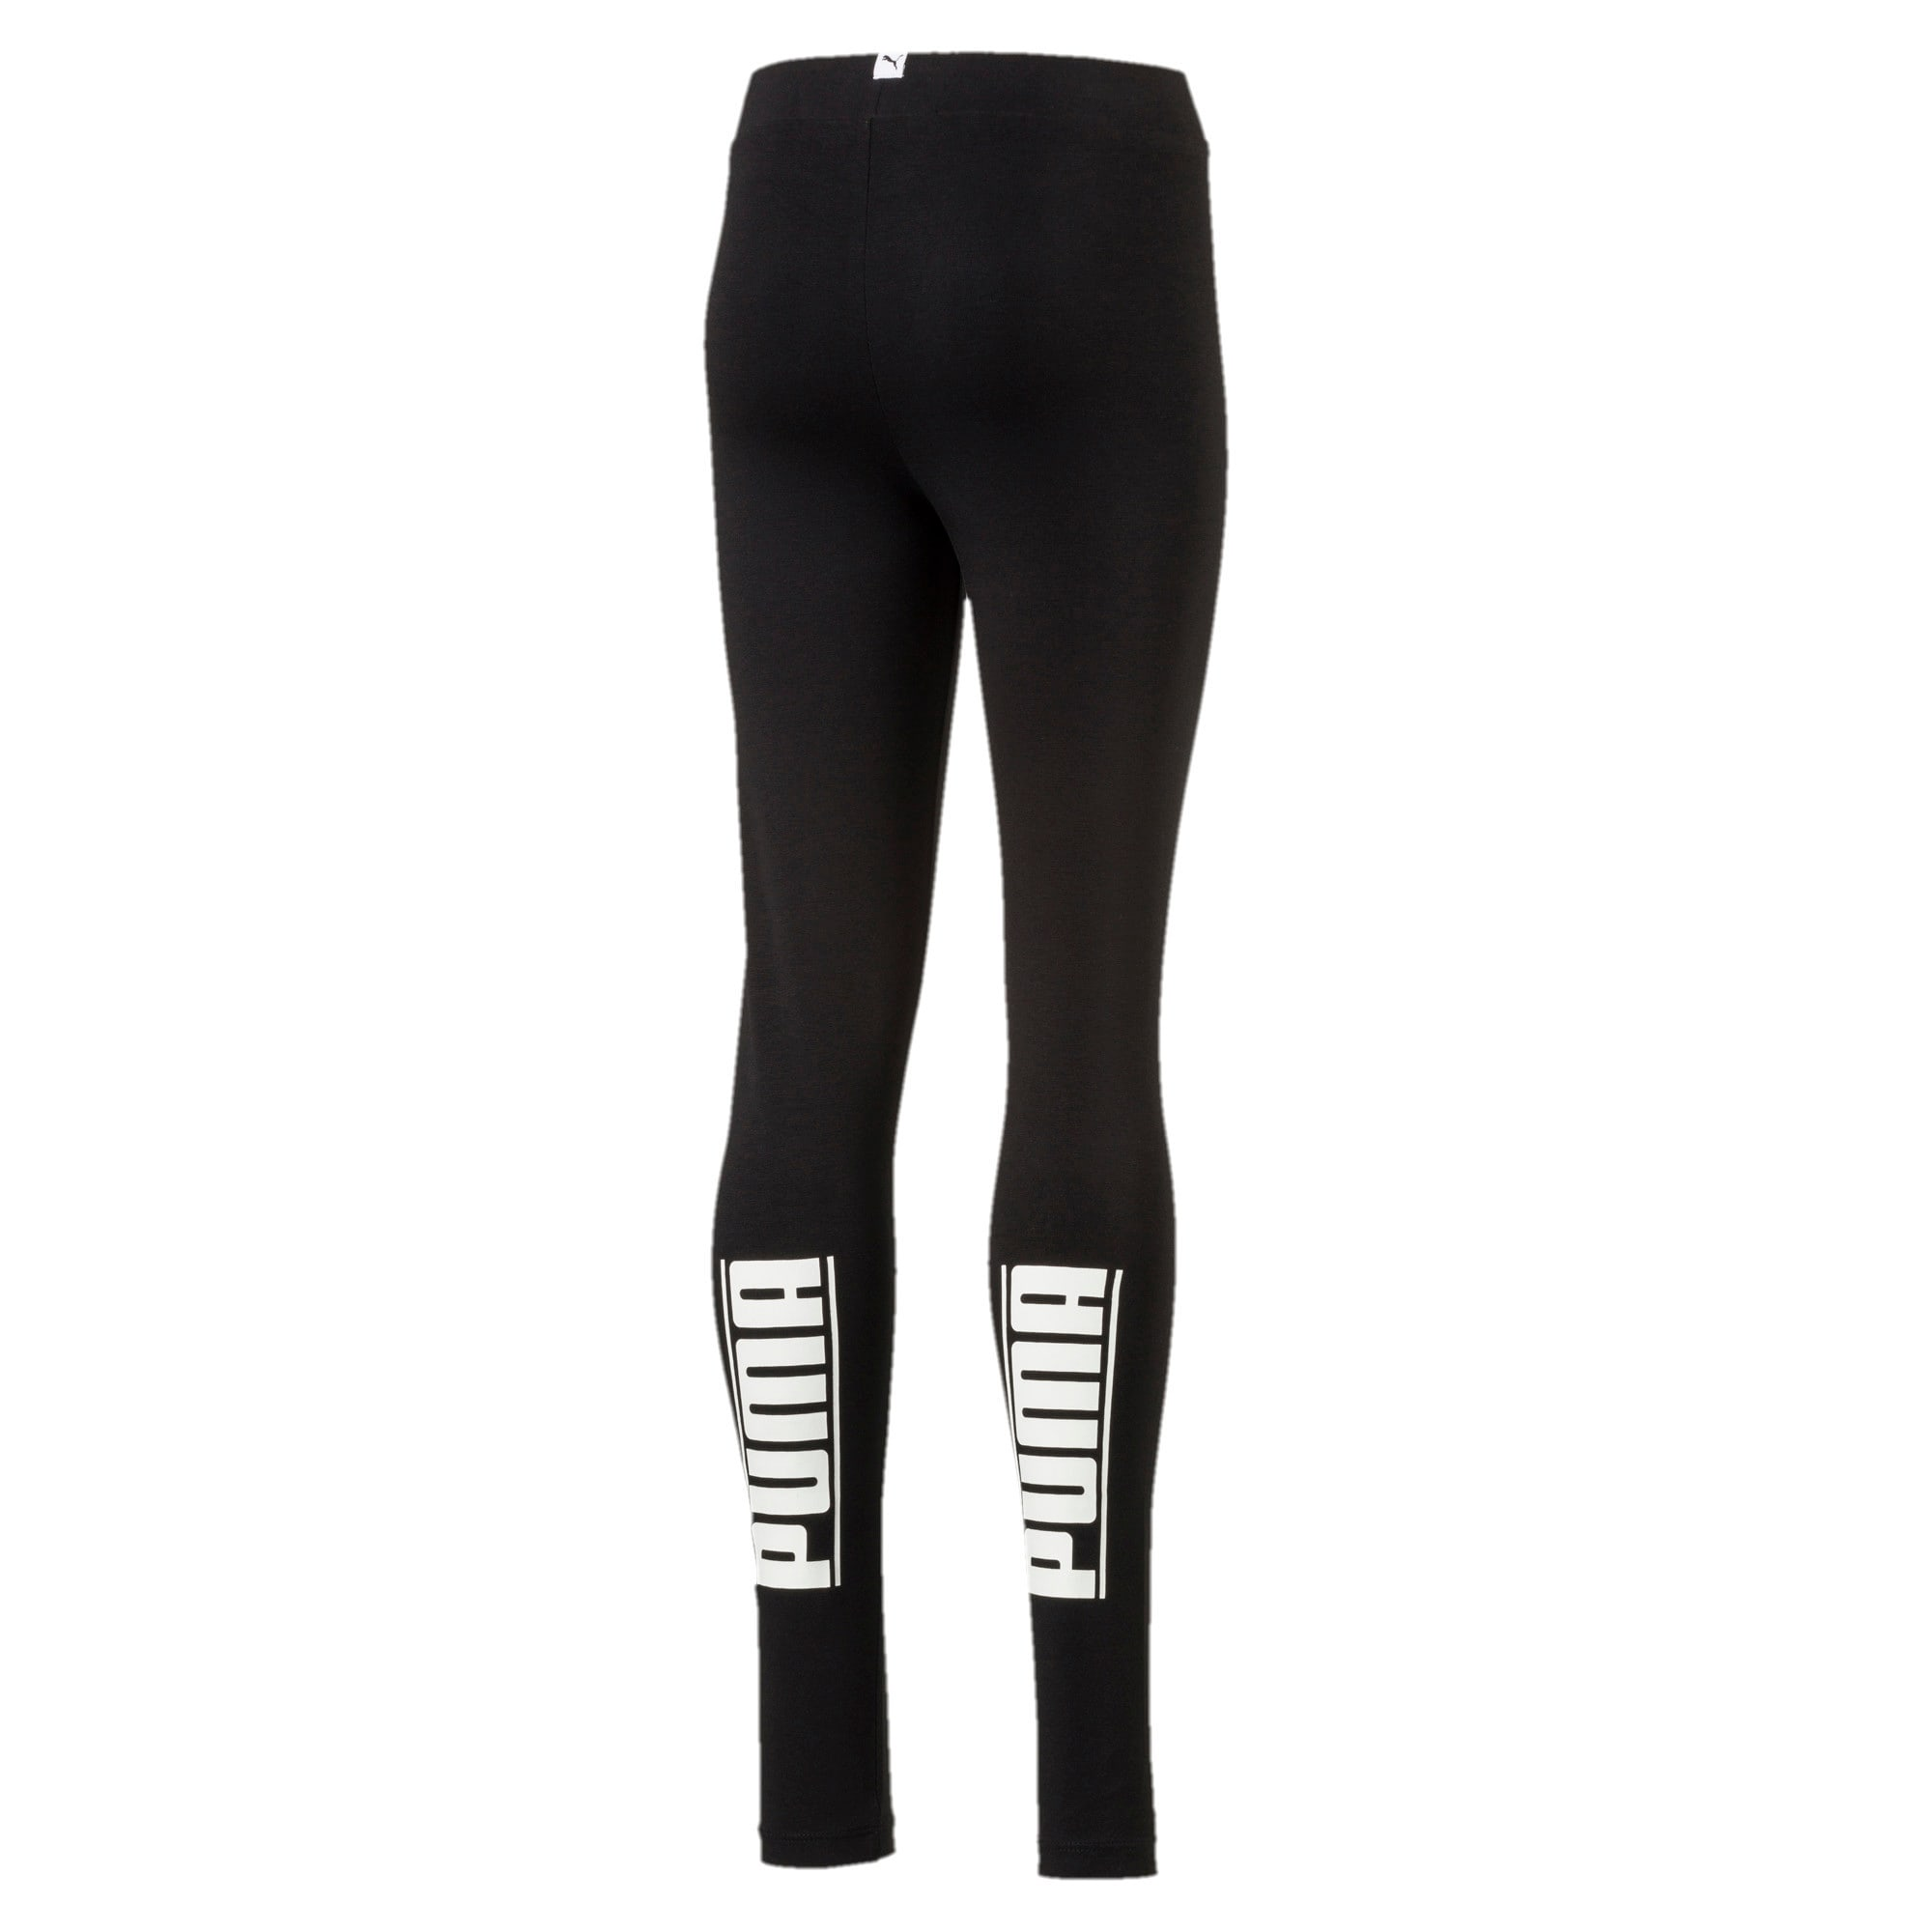 Thumbnail 2 of Girls' Style Leggings, Cotton Black, medium-IND